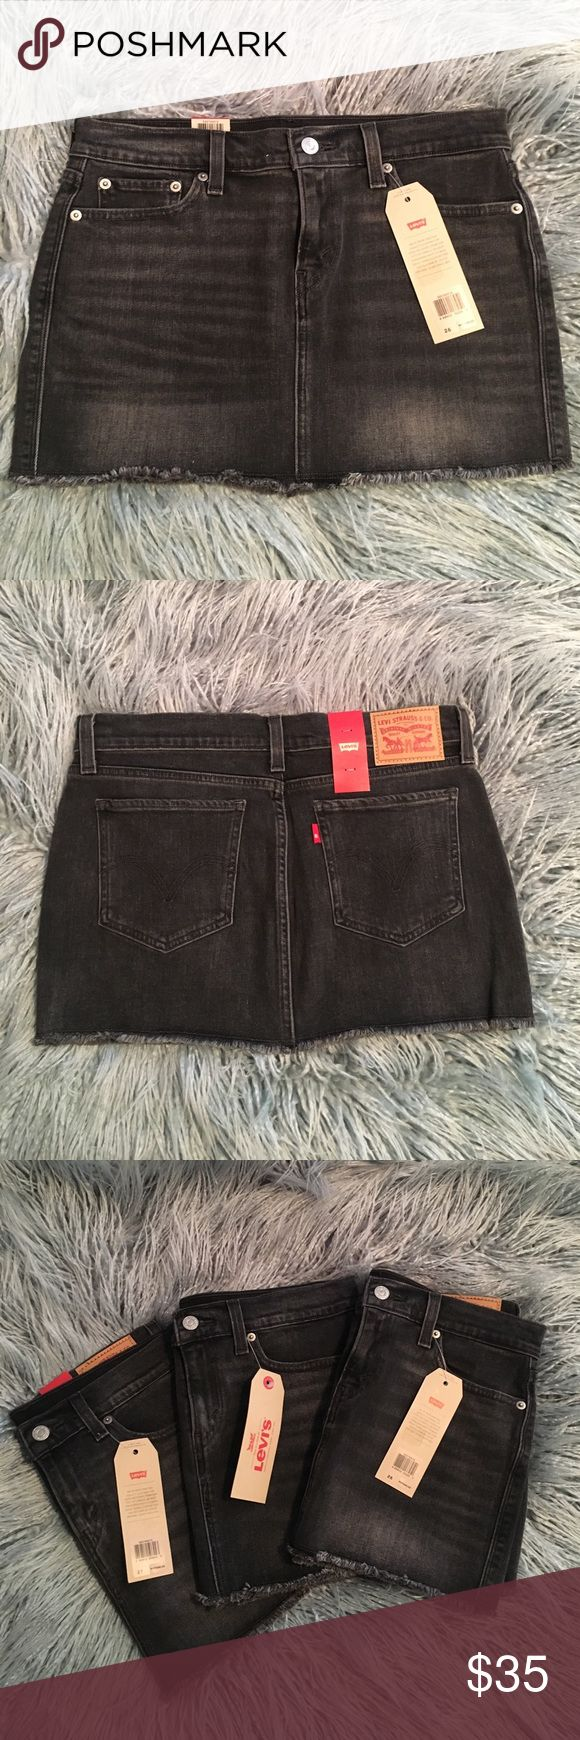 Levi's jean mini skirt. Black jean mini skirt. All brand new never worn with Tags. Levi's Jeans Skinny